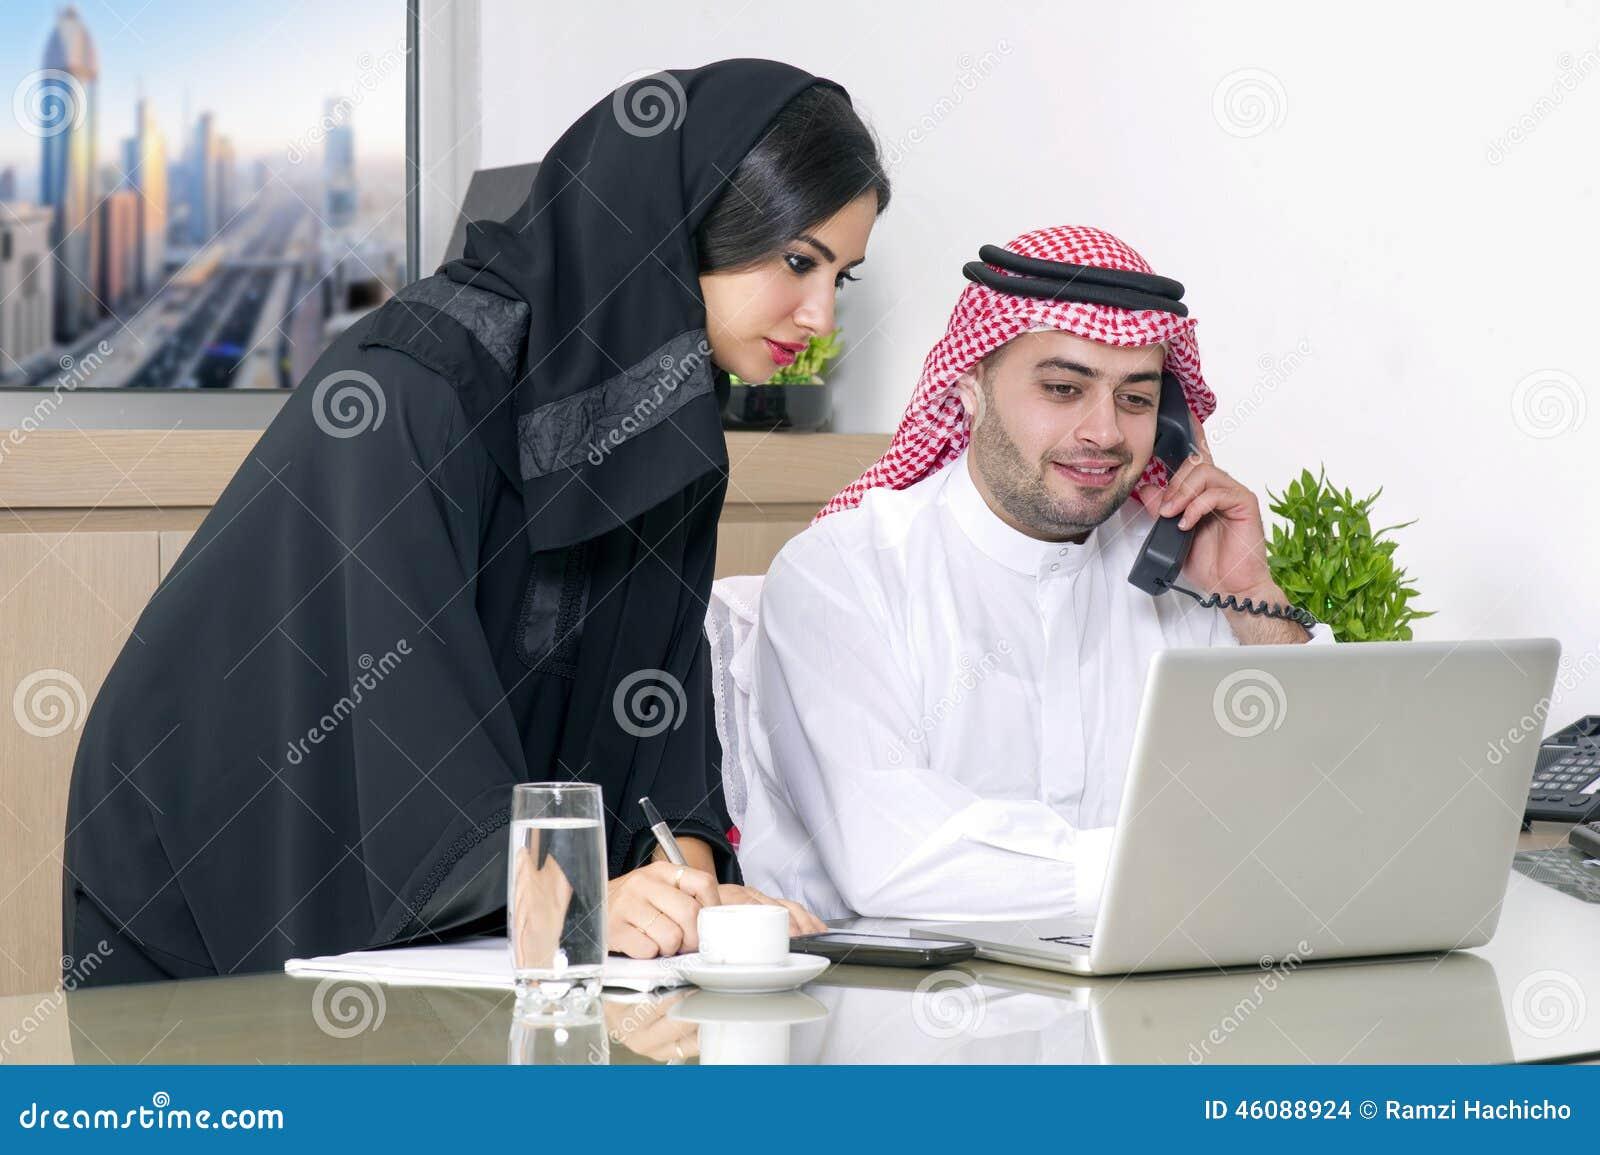 Secretary working on a raise 4